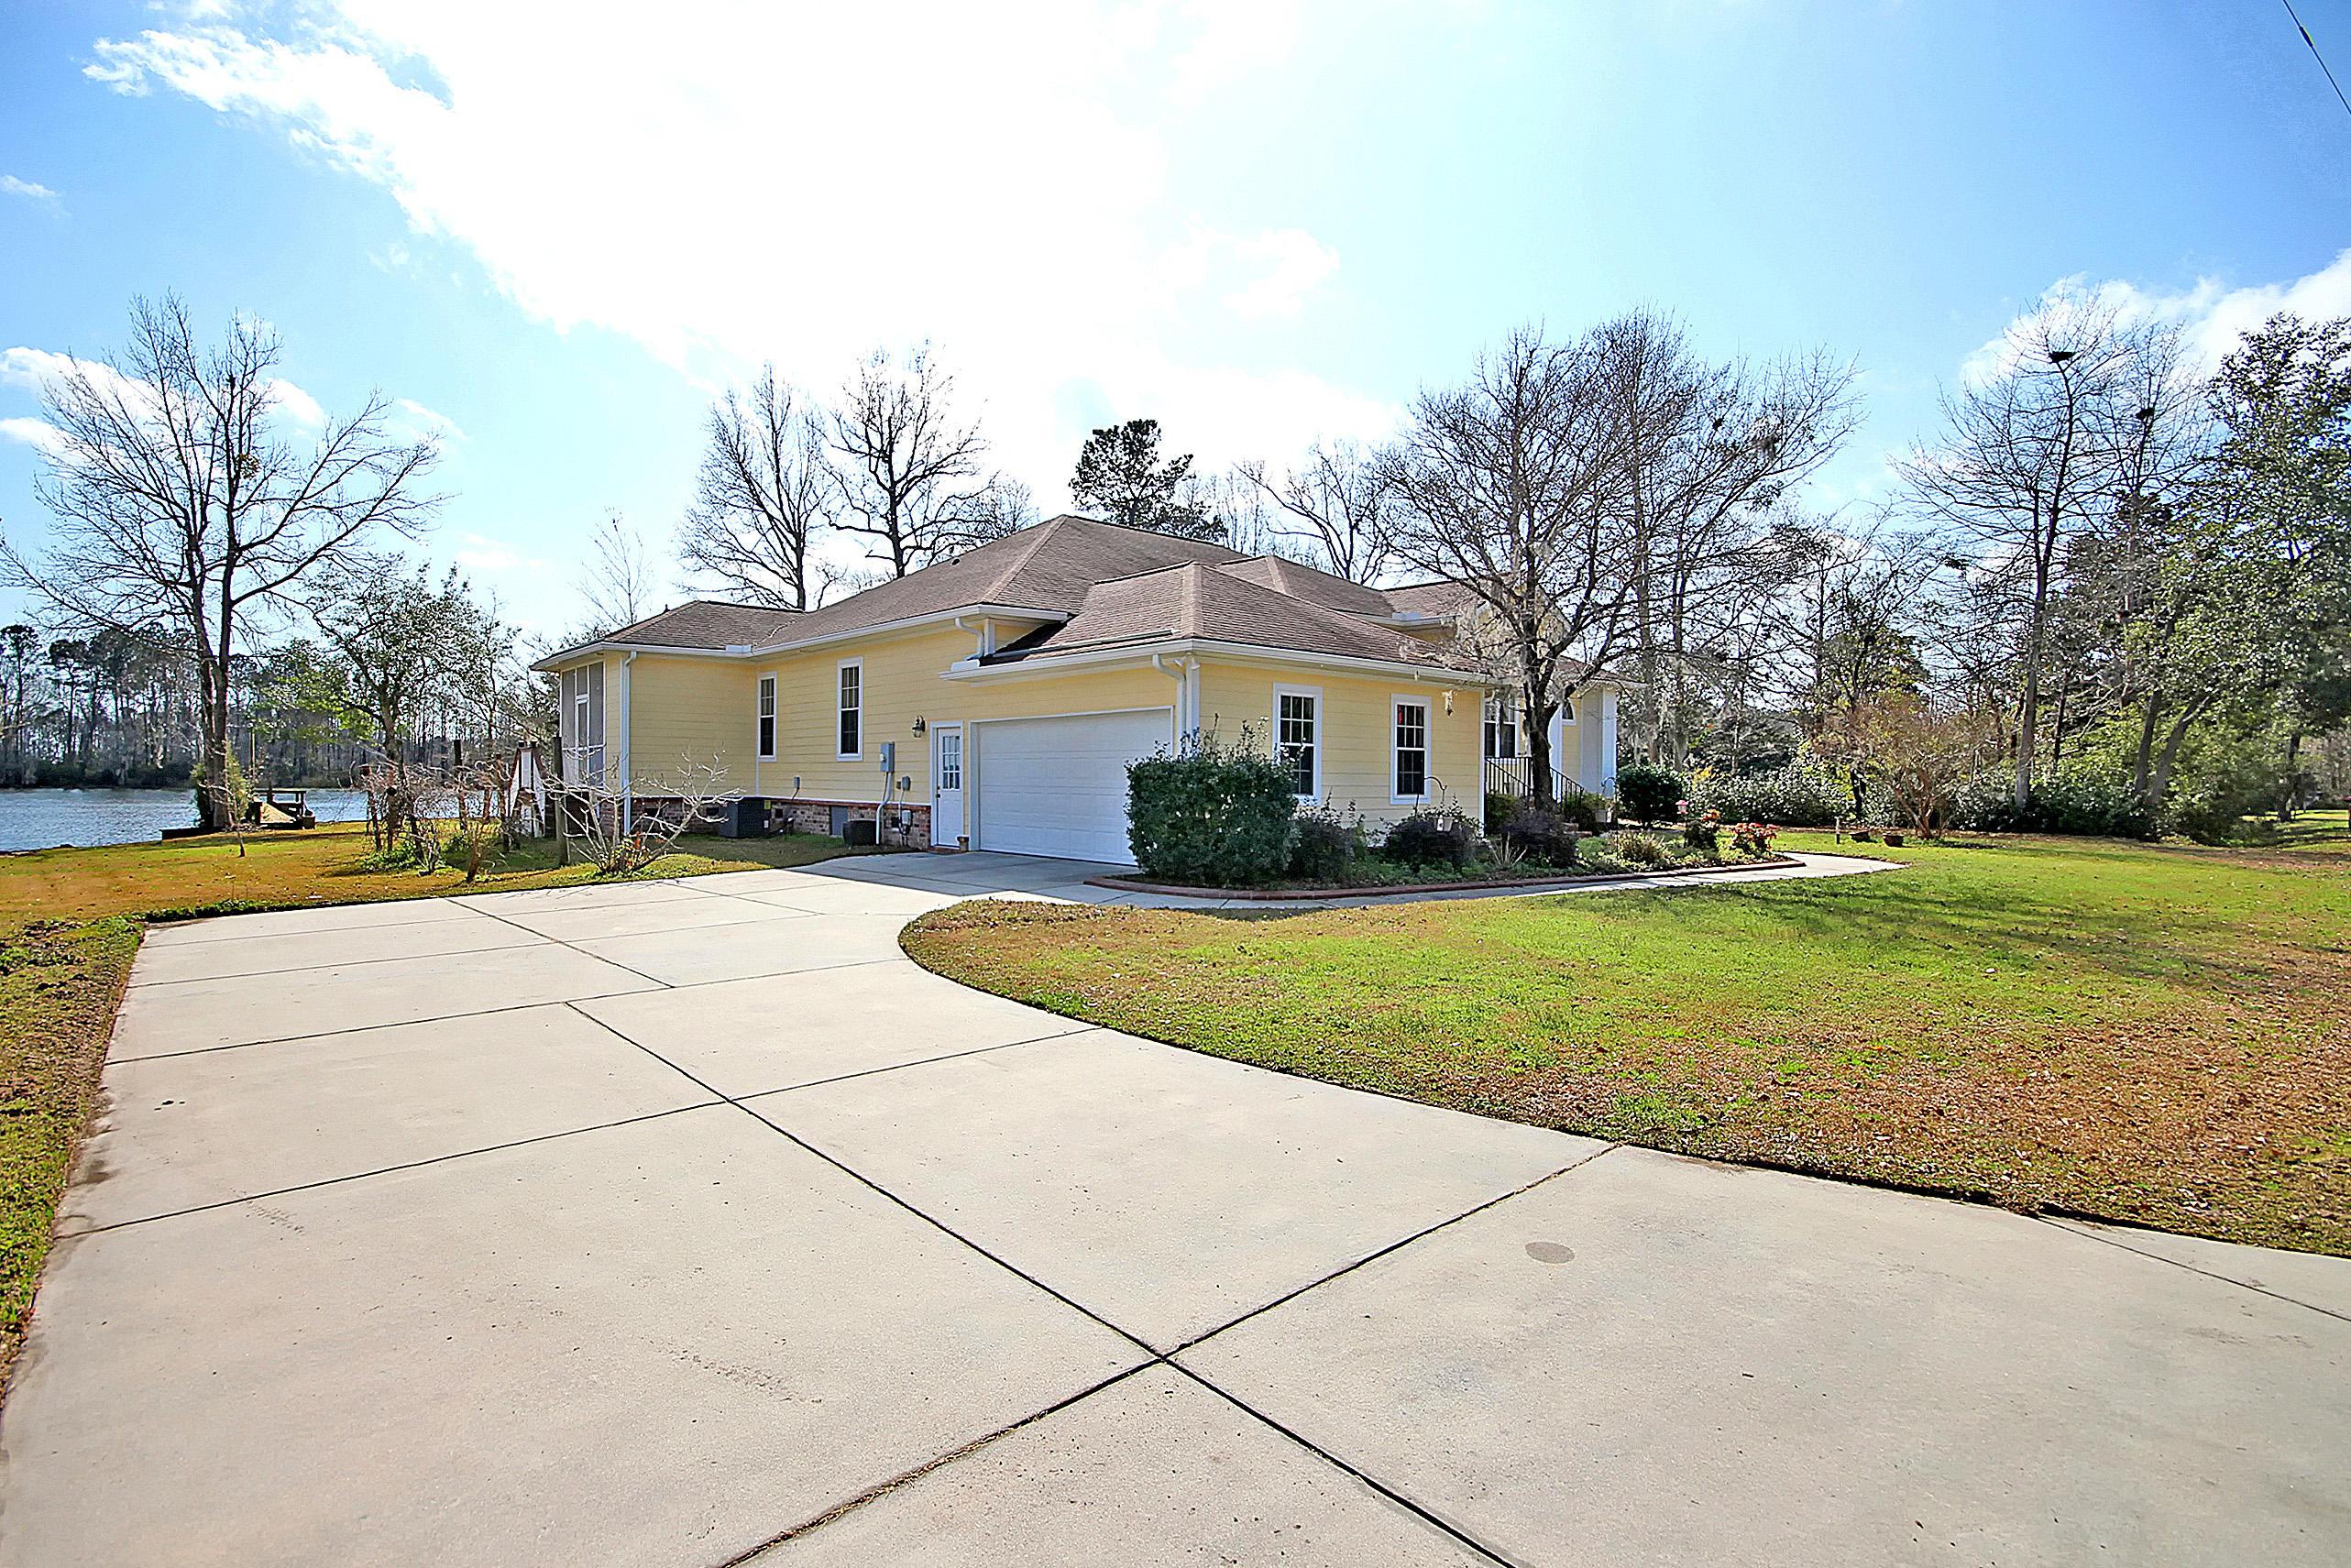 Cross Subd (Longpoint) Homes For Sale - 1191 Longpoint, Cross, SC - 20